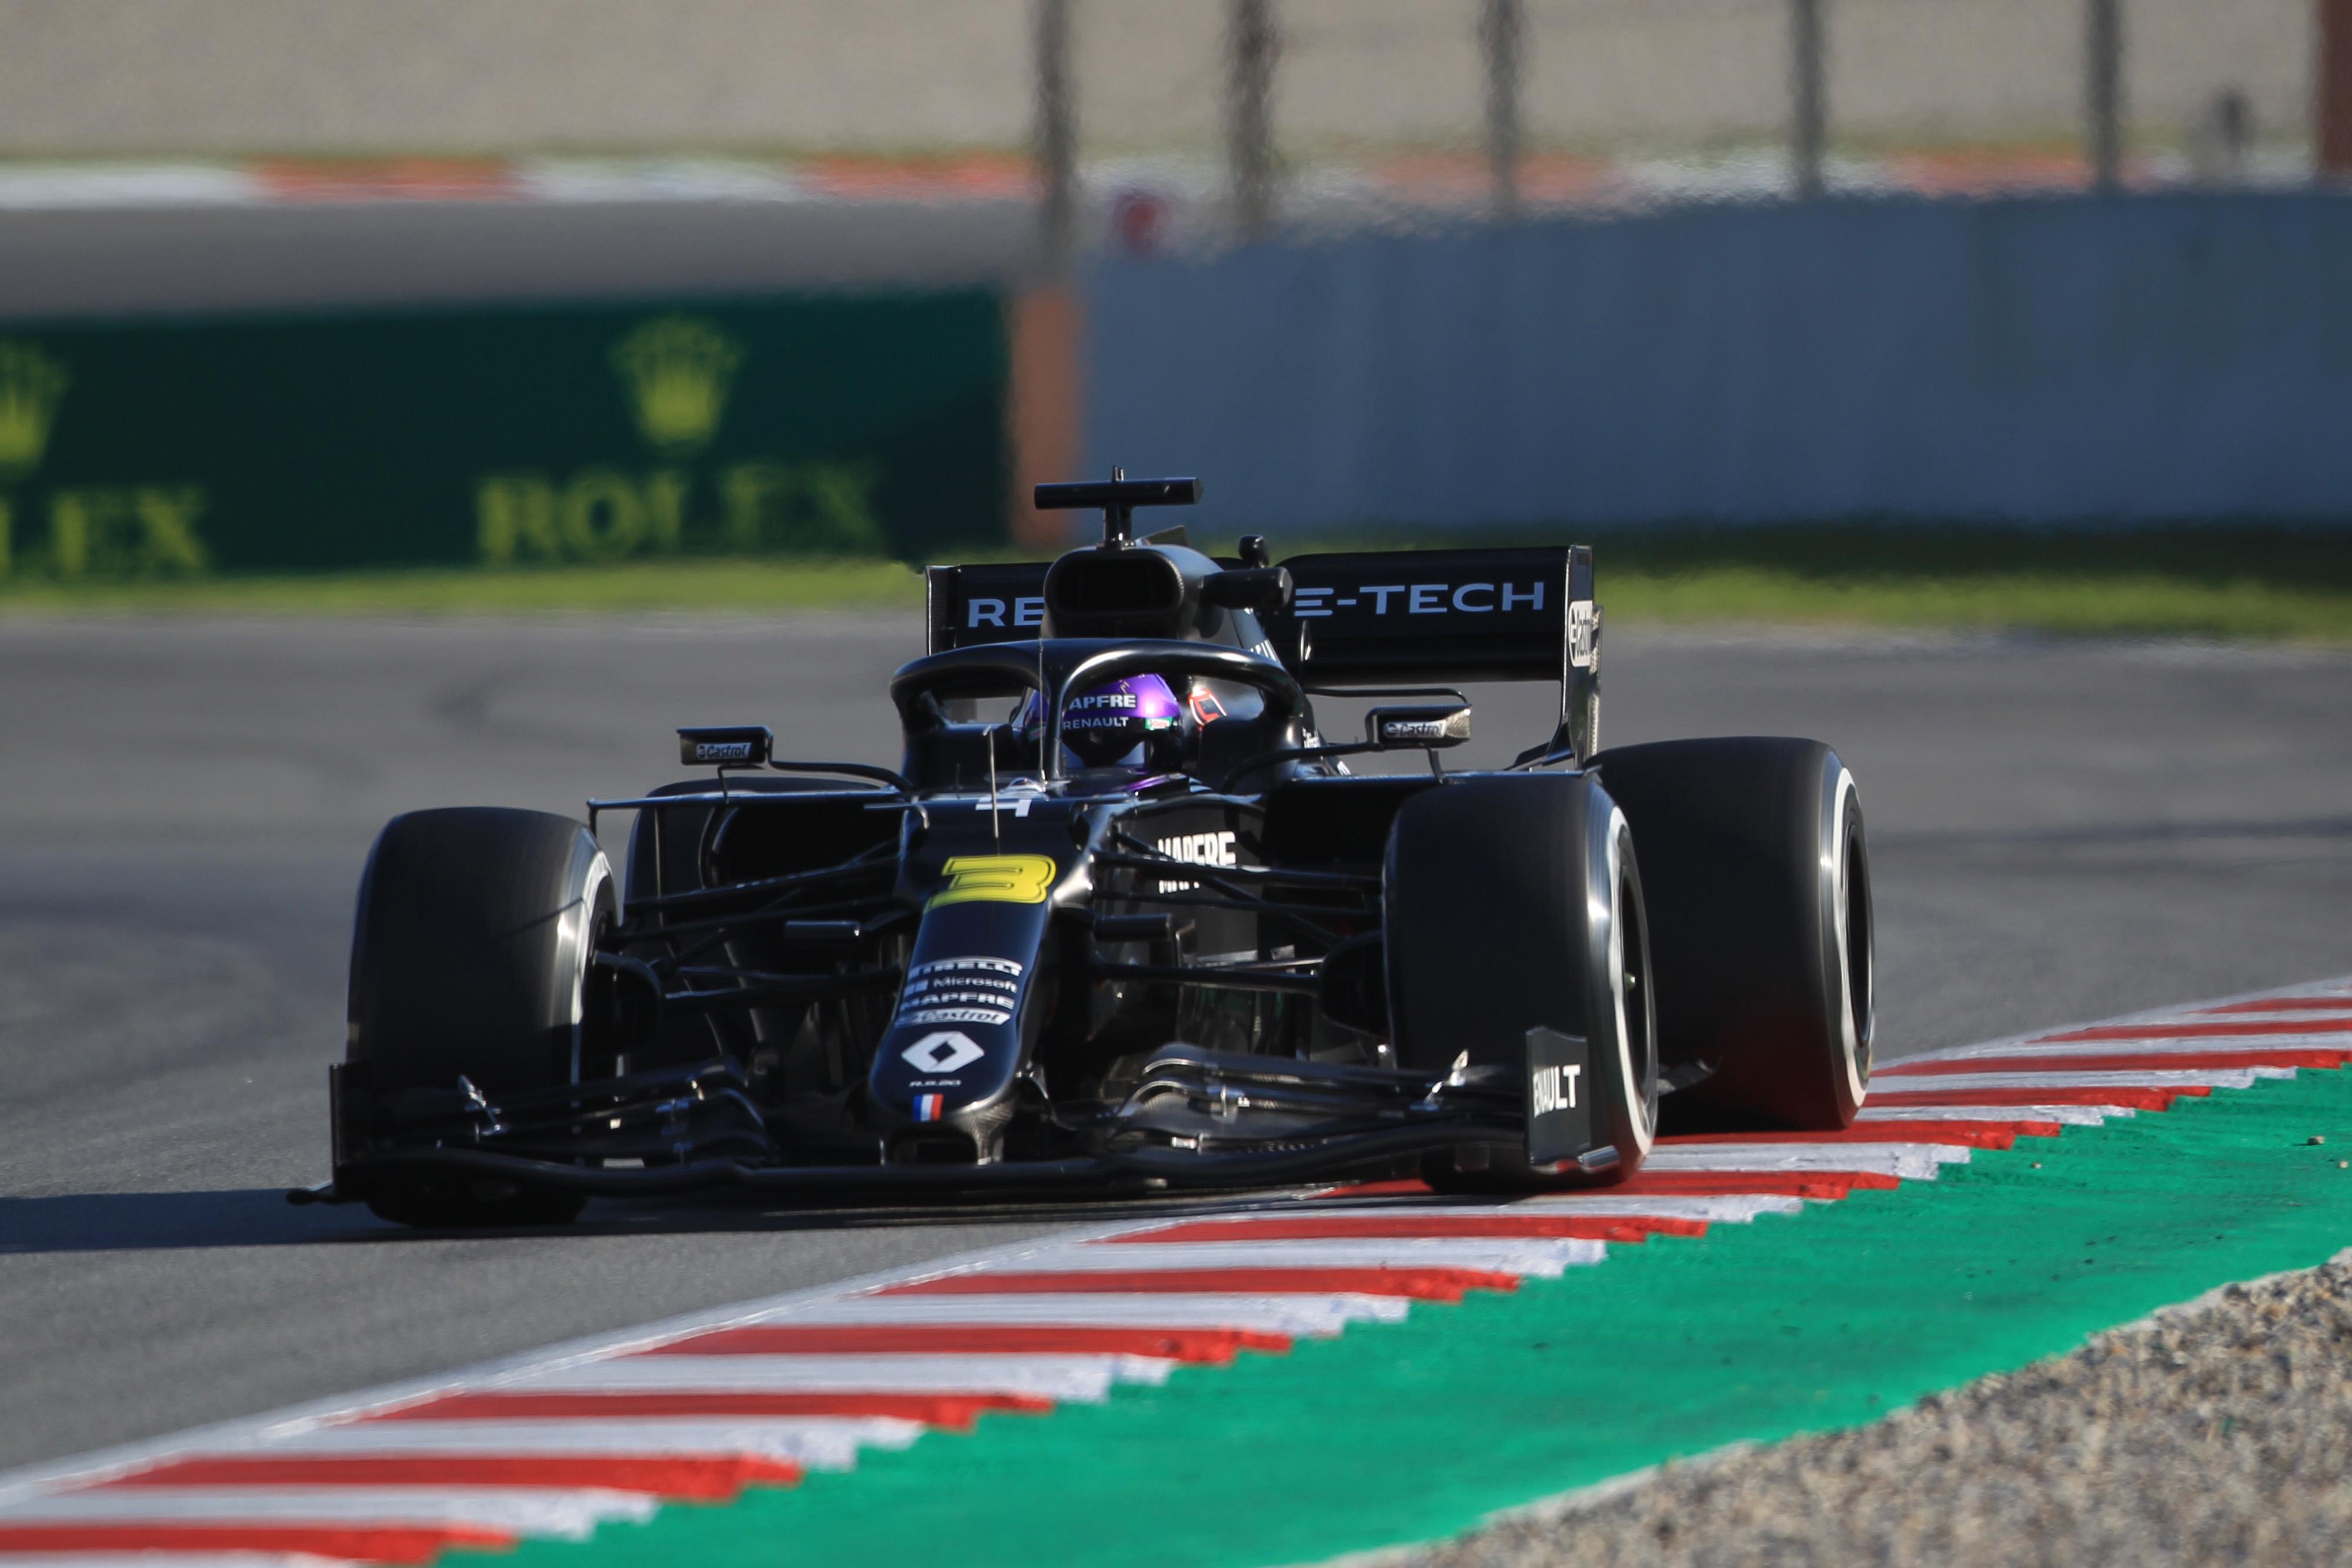 F1 Formula 1 Renault Daniel Ricciardo testing